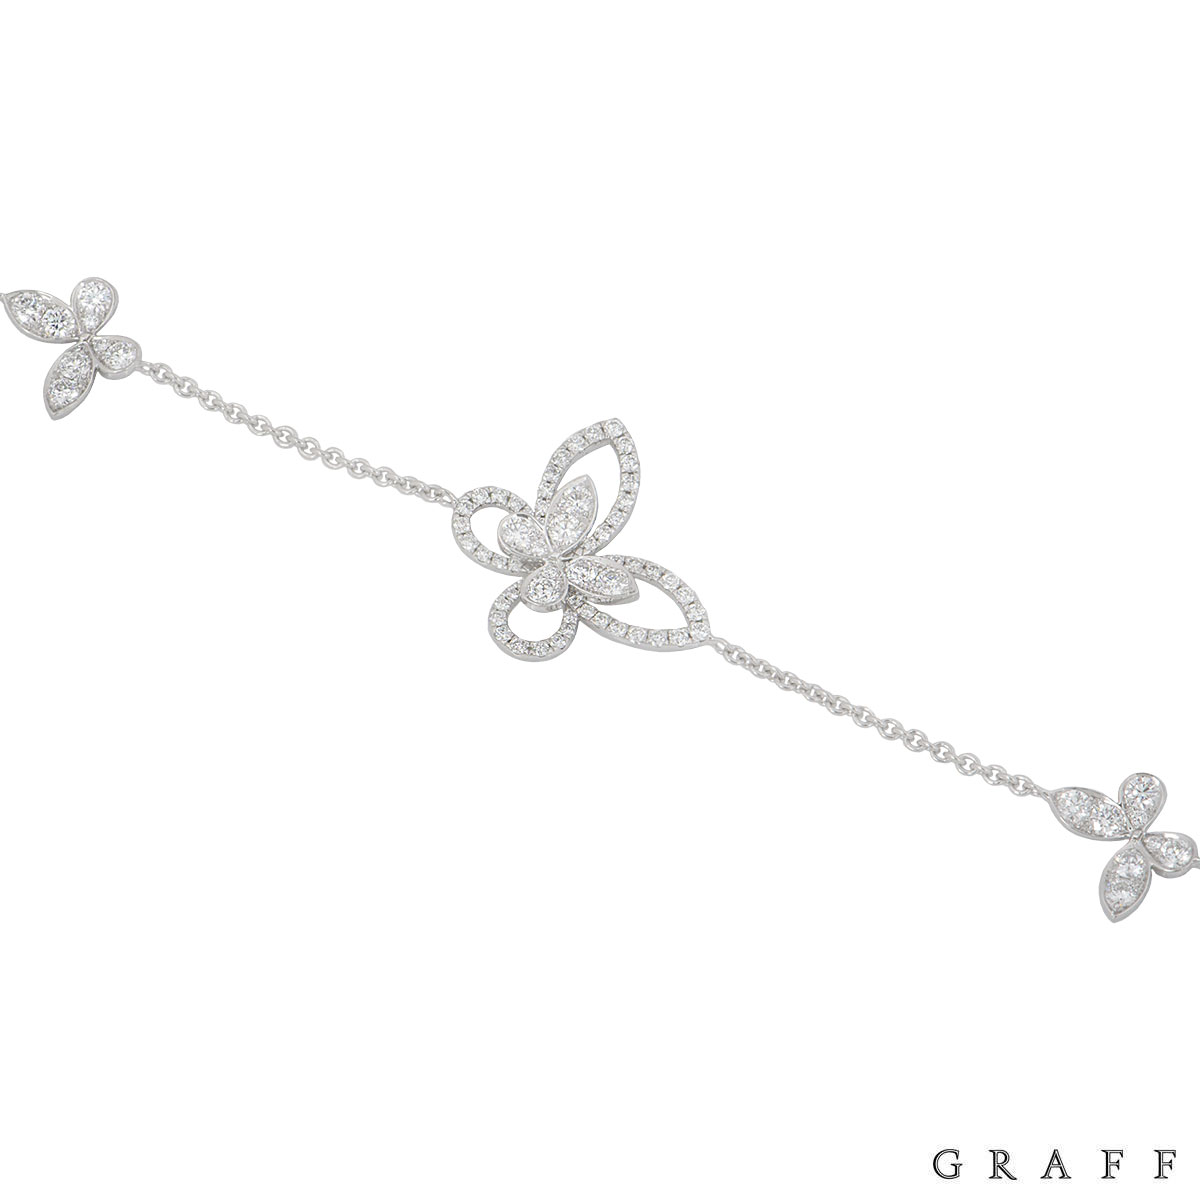 Graff White Gold Diamond Butterfly Silhouette Bracelet